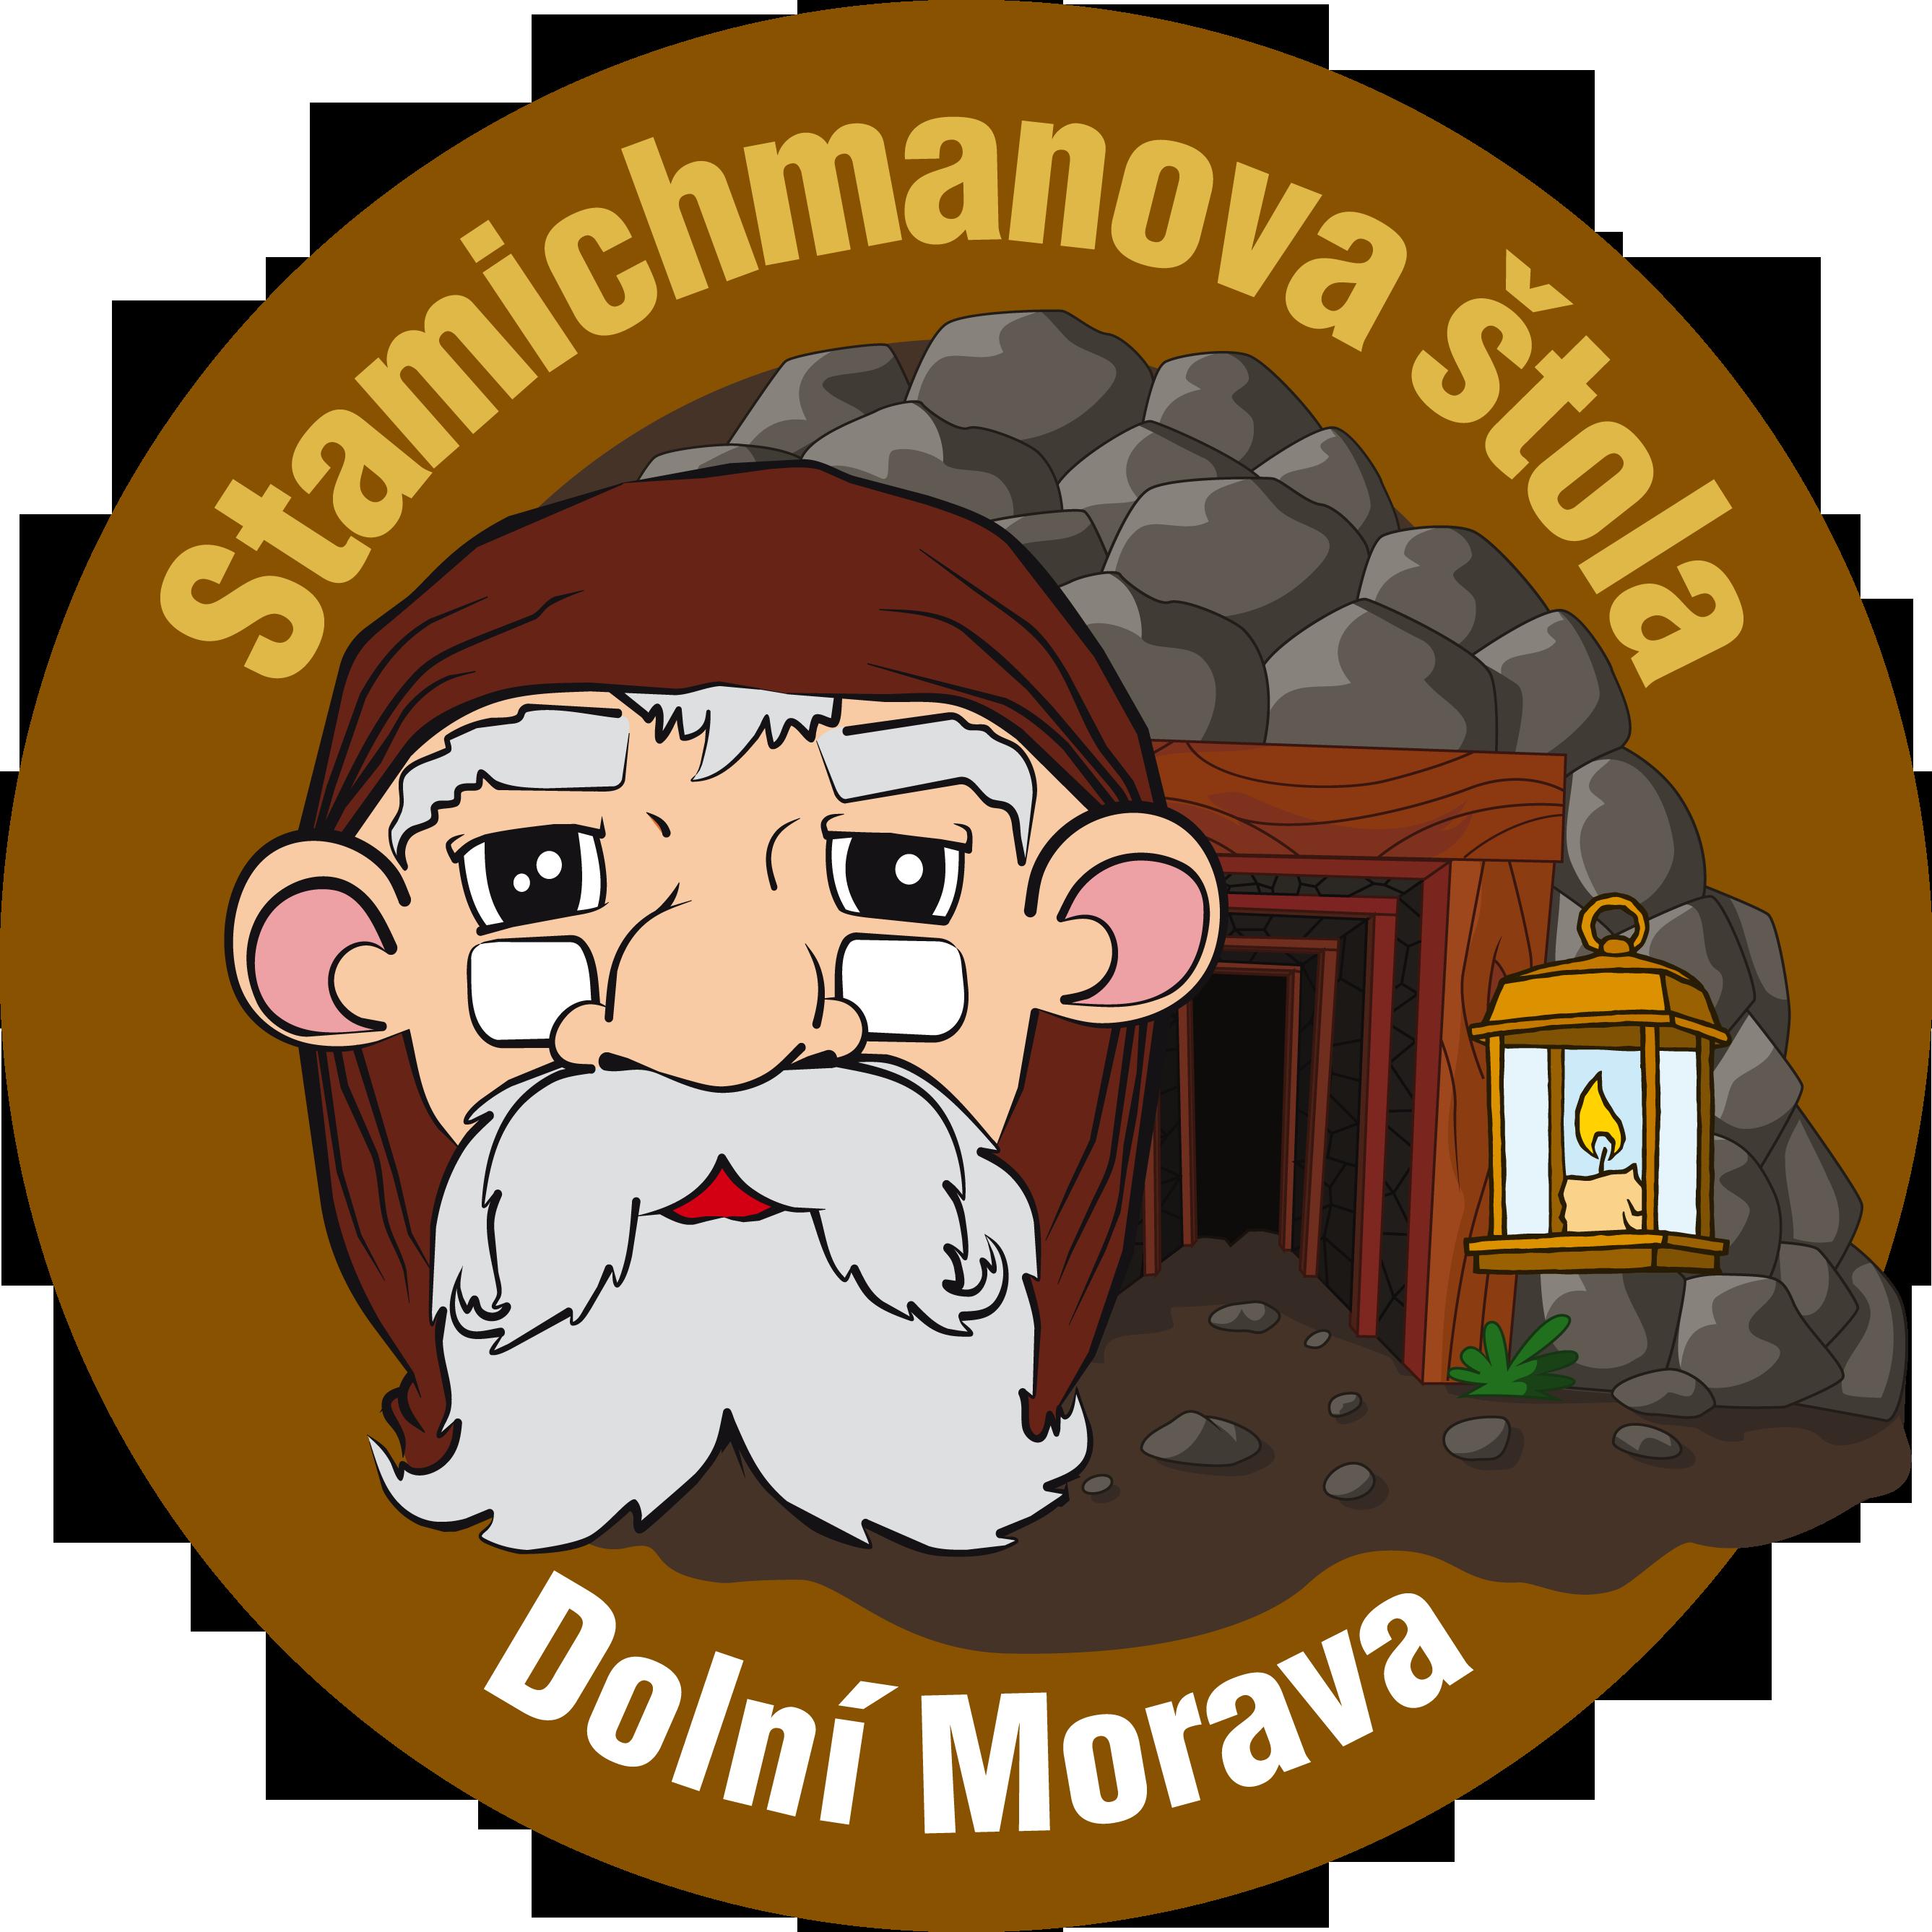 Stamichman_logo